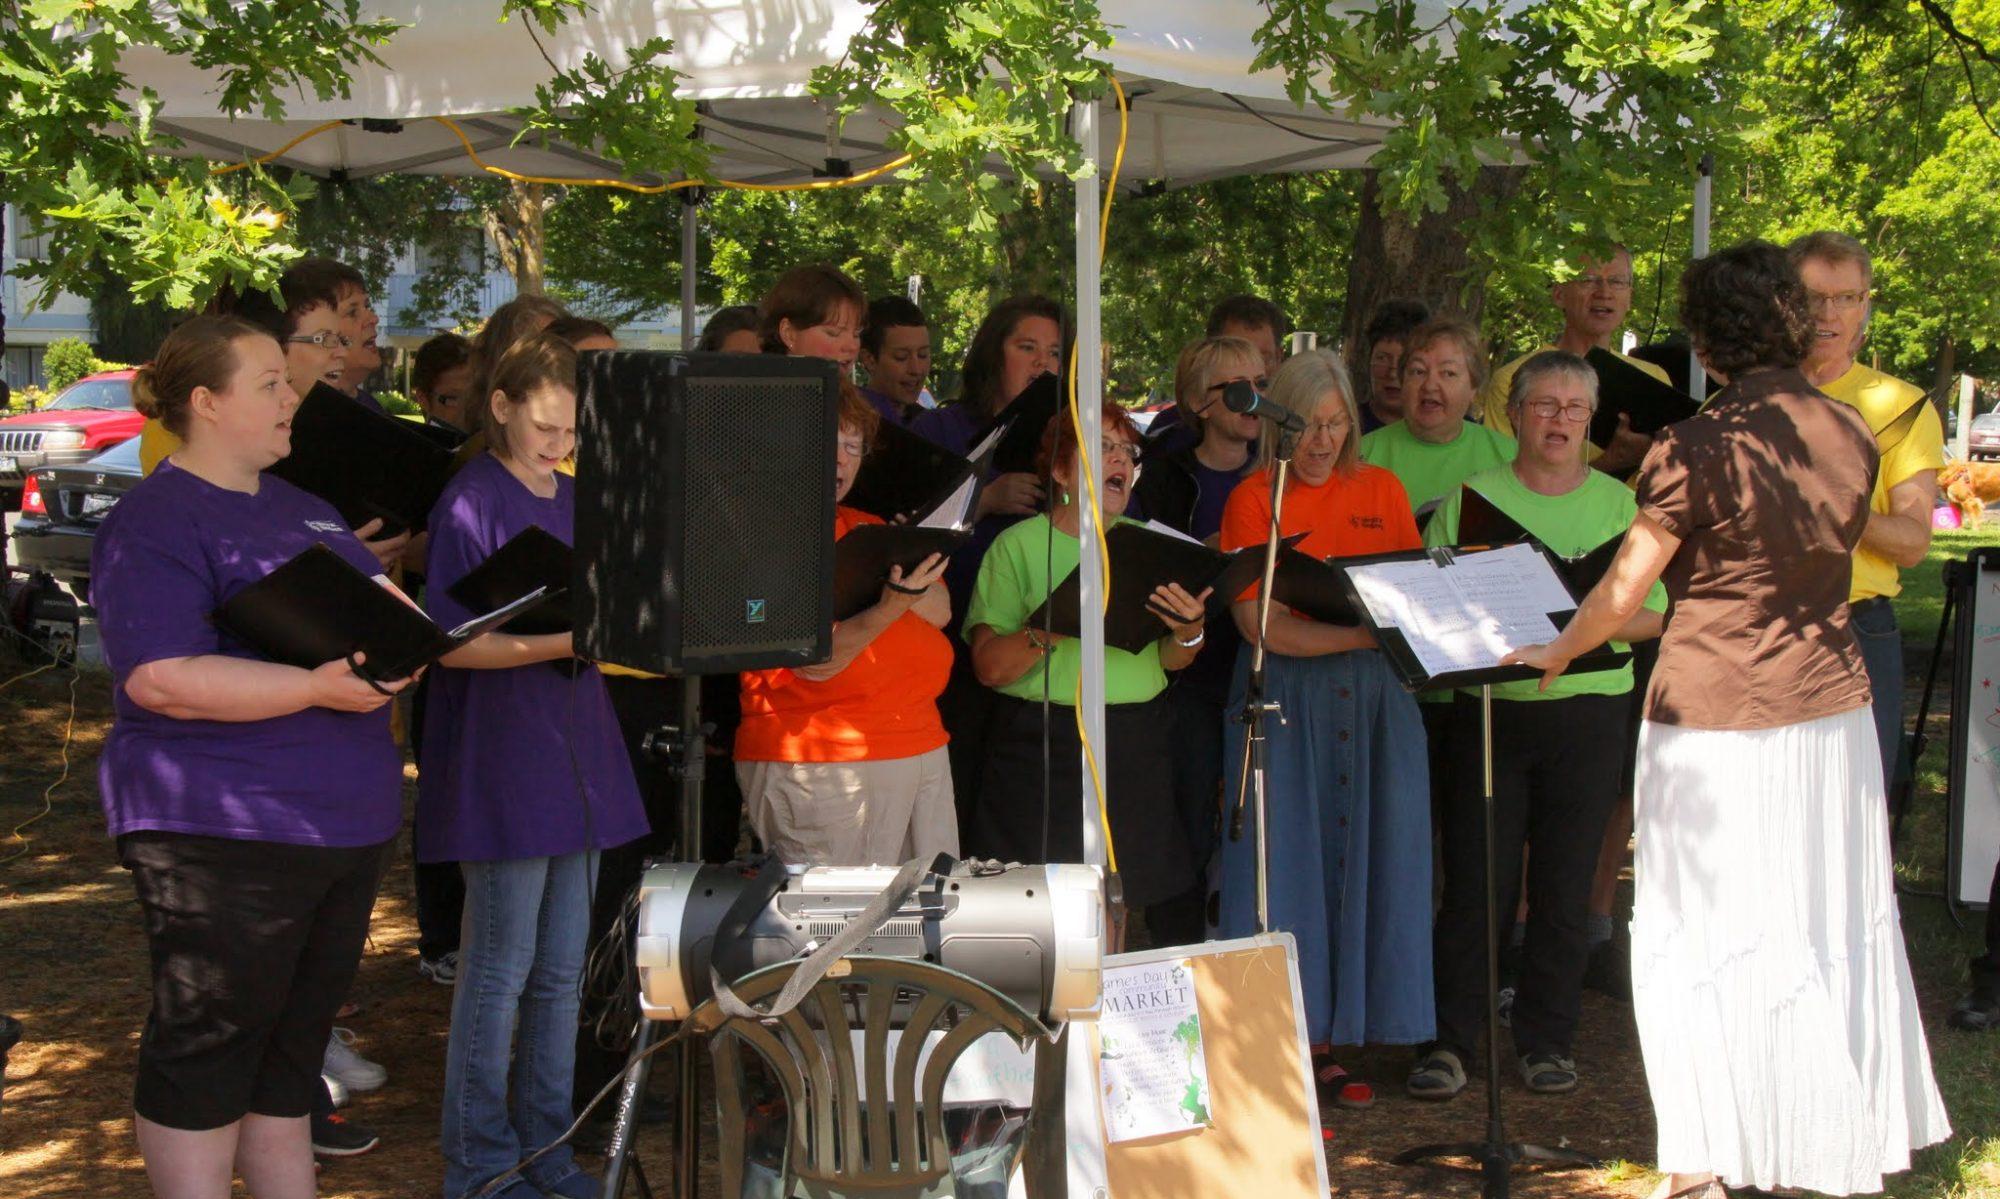 The Allegra Singers